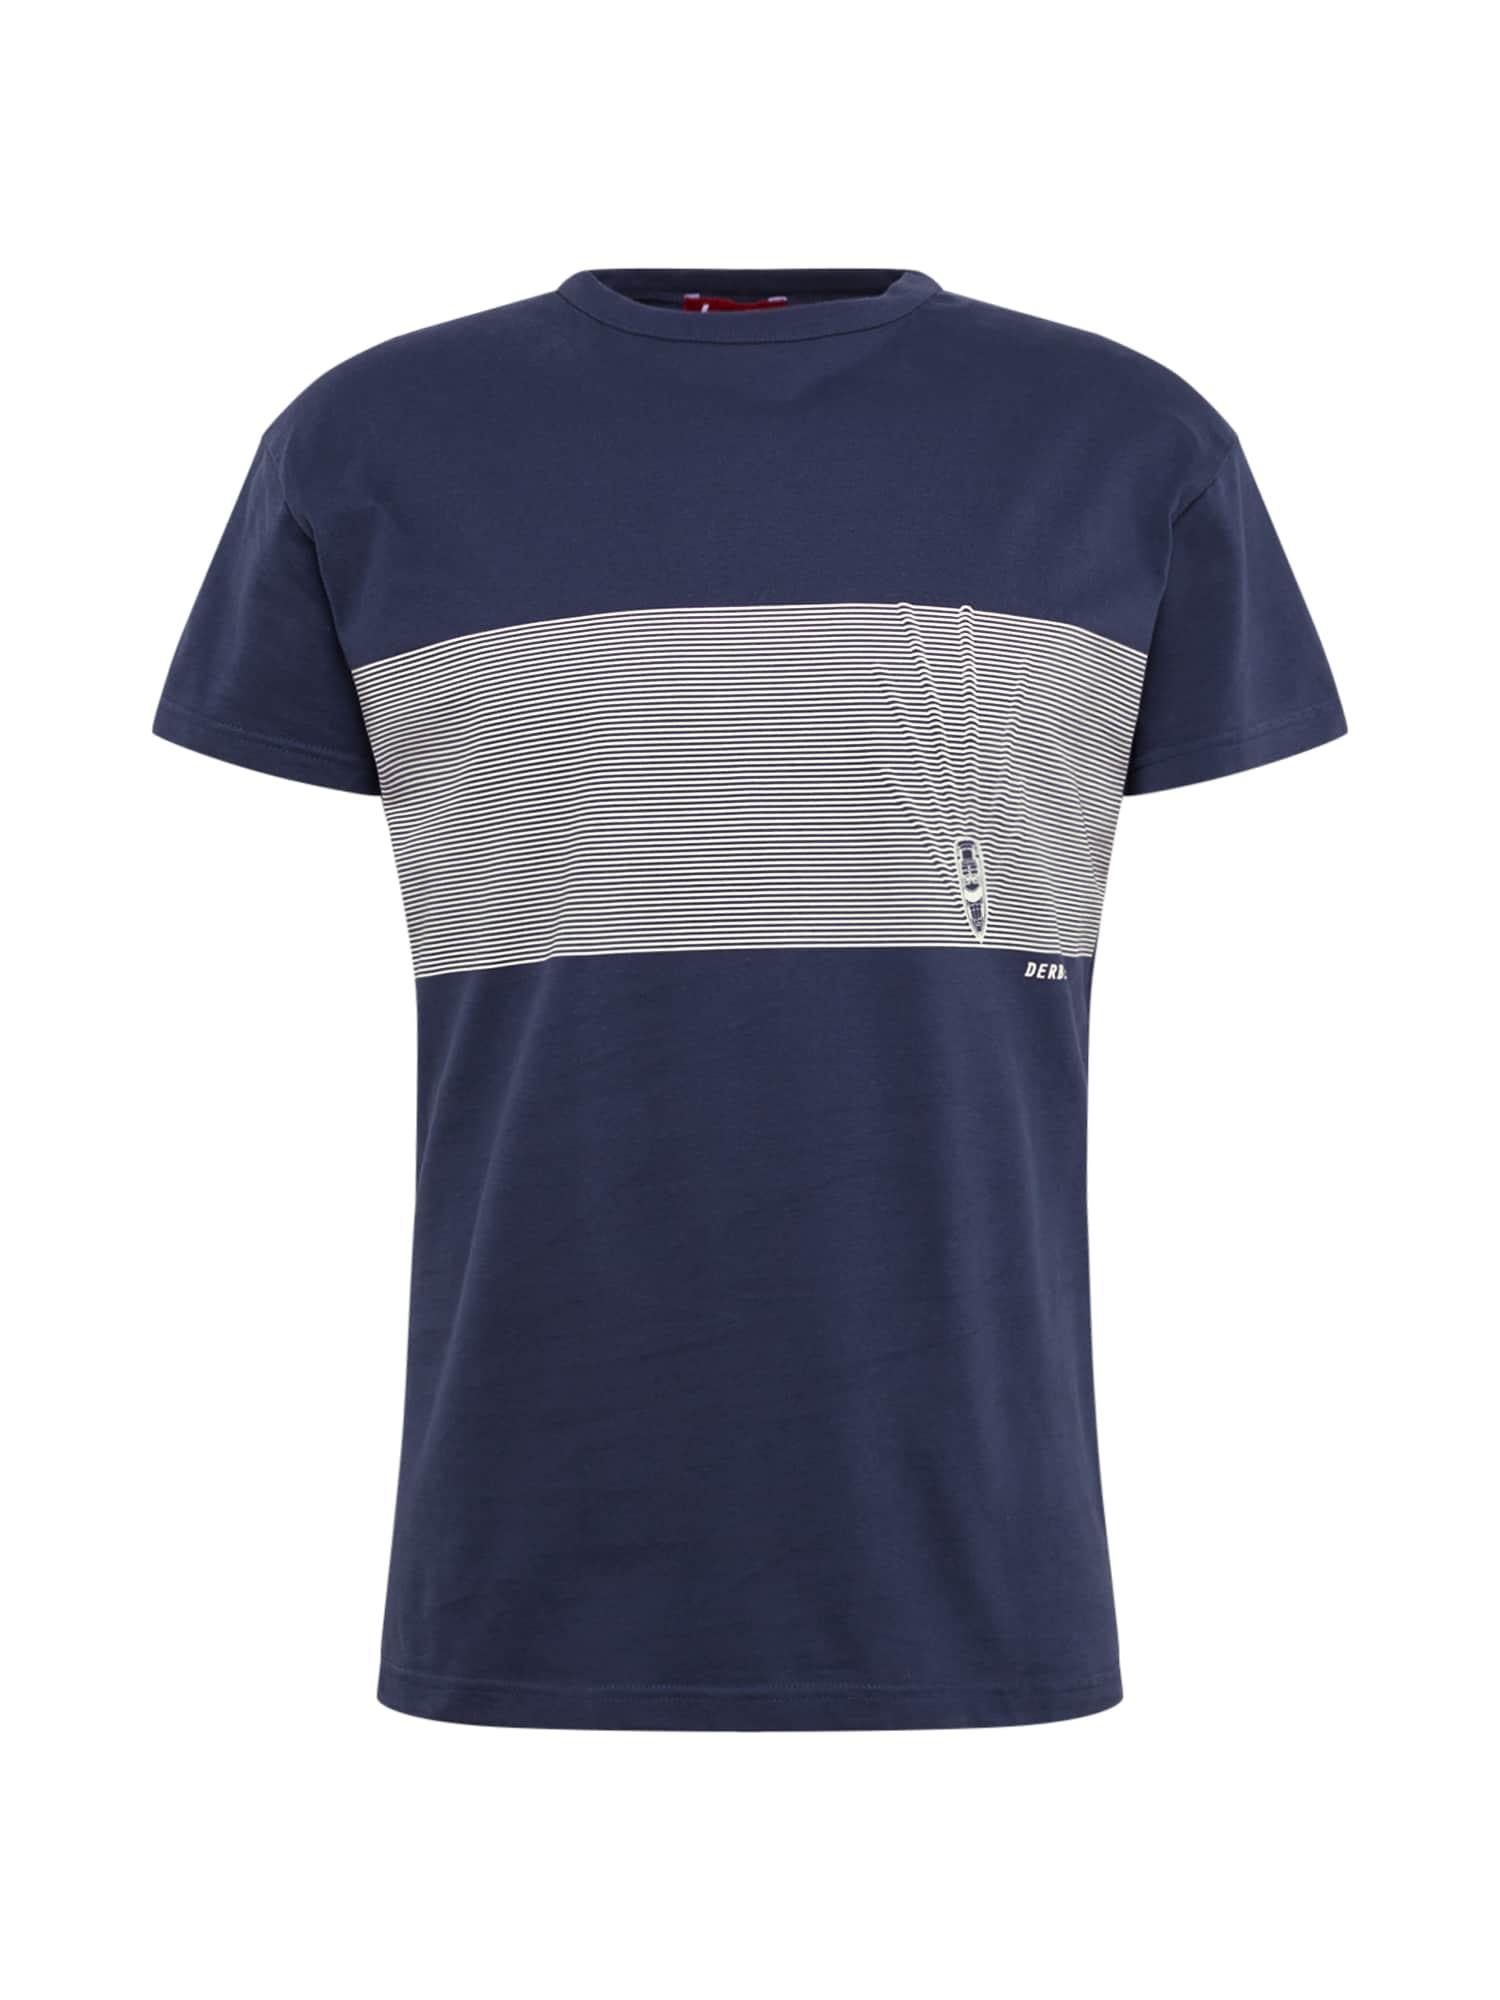 Derbe Marškinėliai 'Kink OC' pilka / tamsiai mėlyna